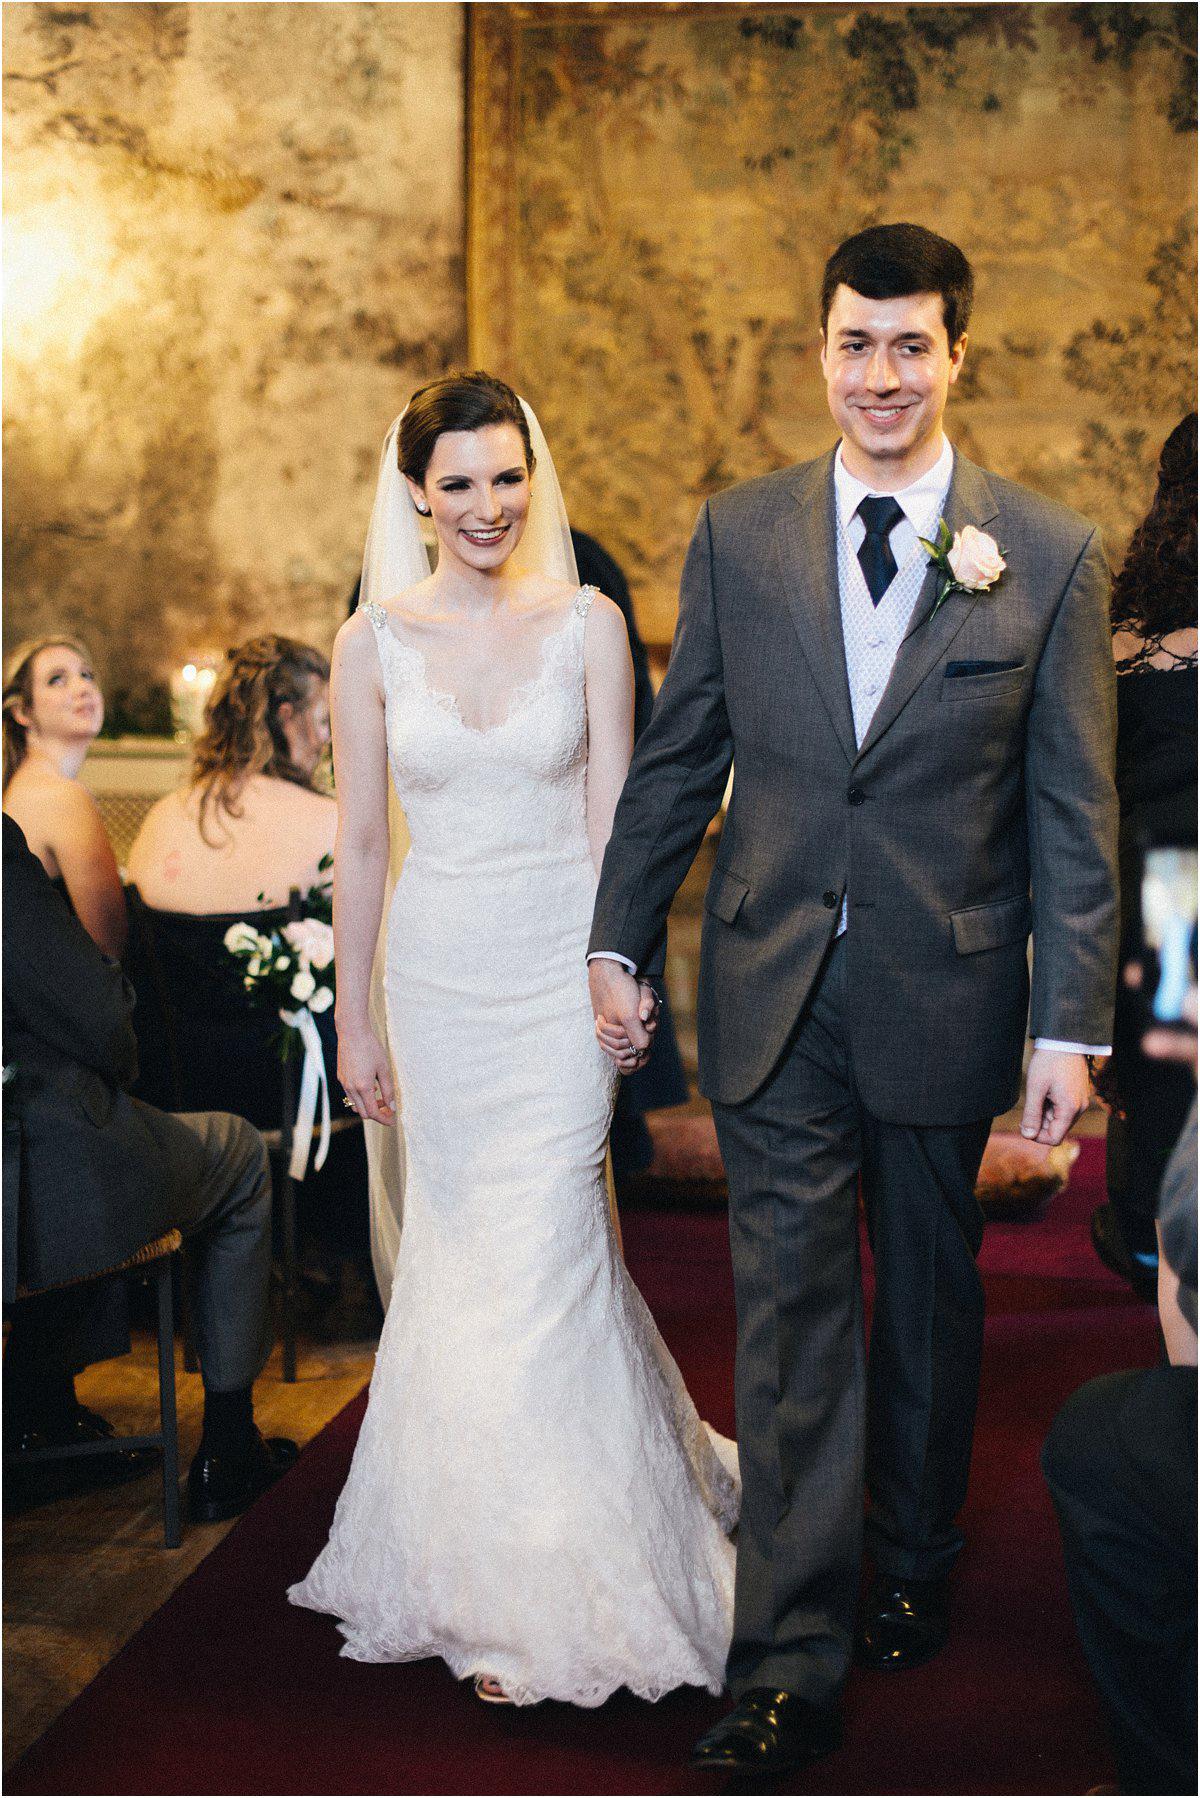 Crofts & Kowalczyk Photography Dundas Castle Edinburgh Scotland wedding